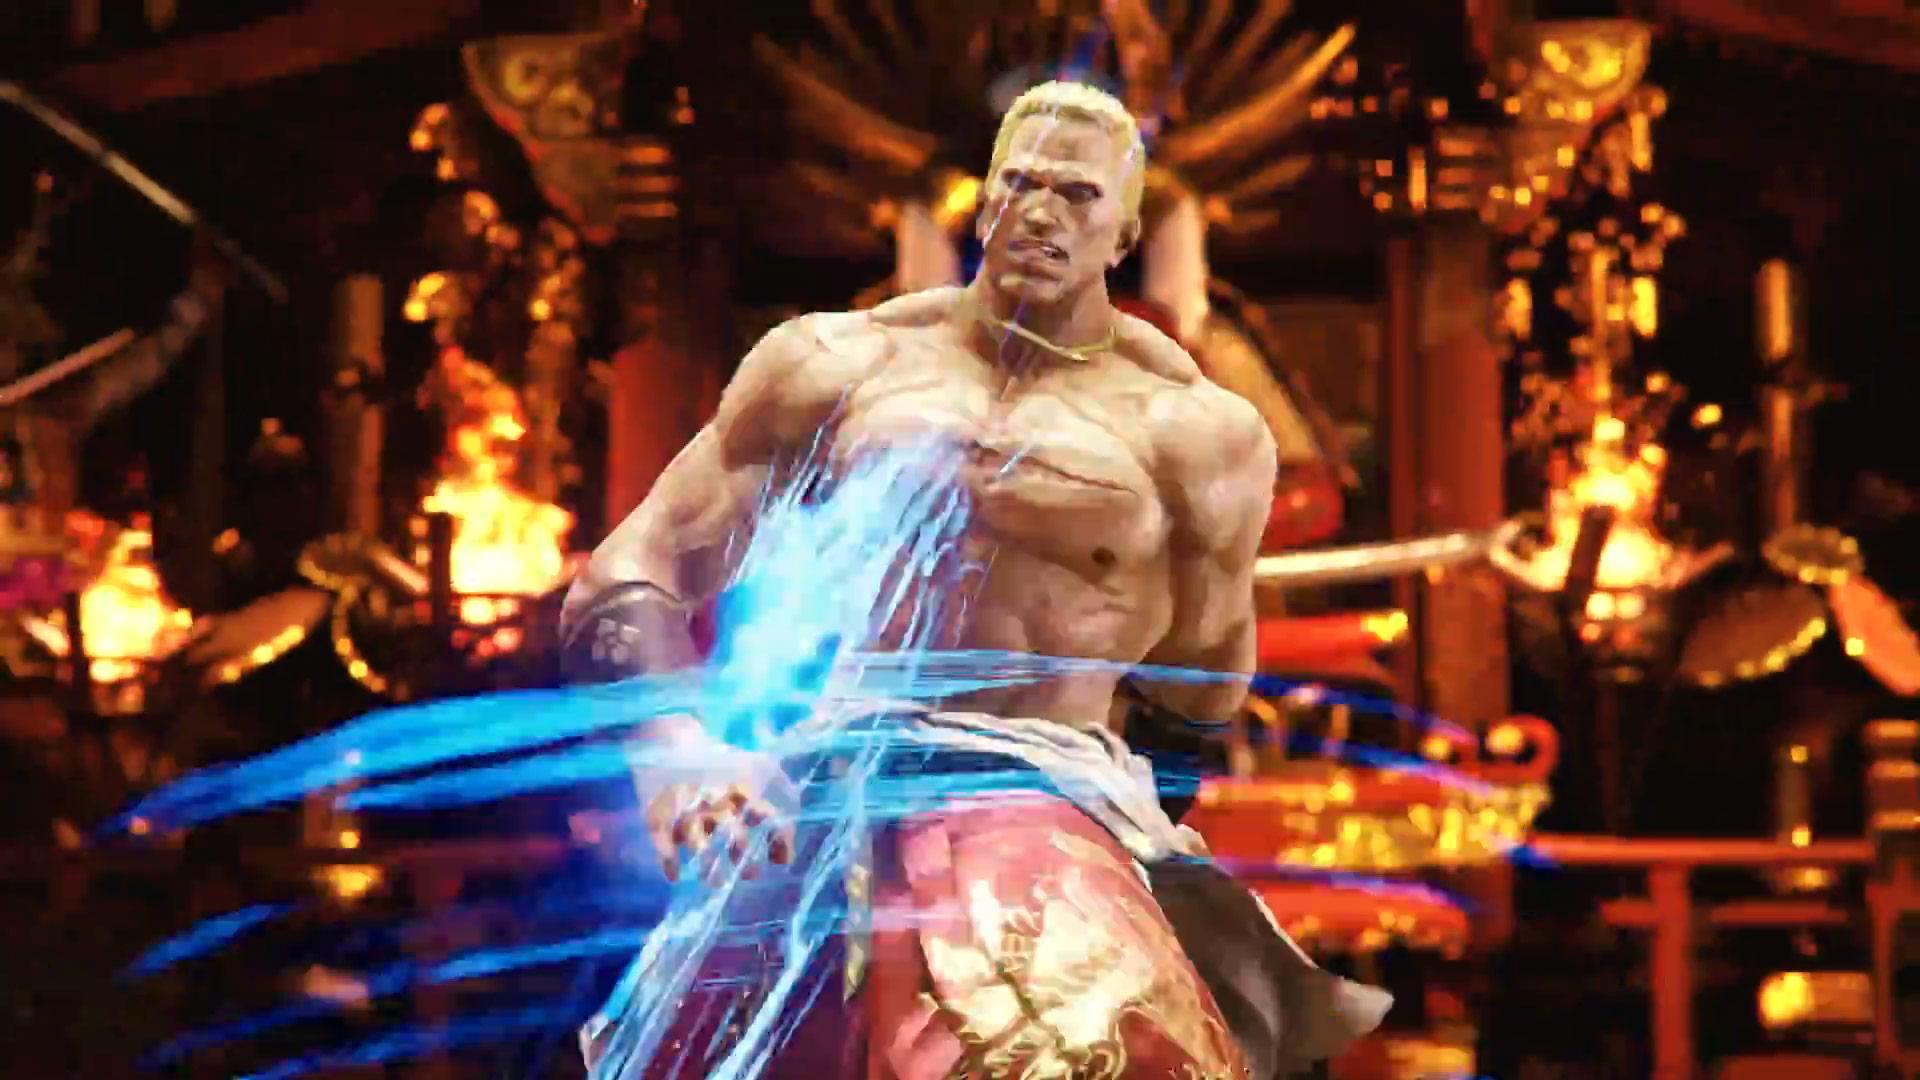 Geese Howard Tekken 7 Screen Shots 9 Out Of 9 Image Gallery